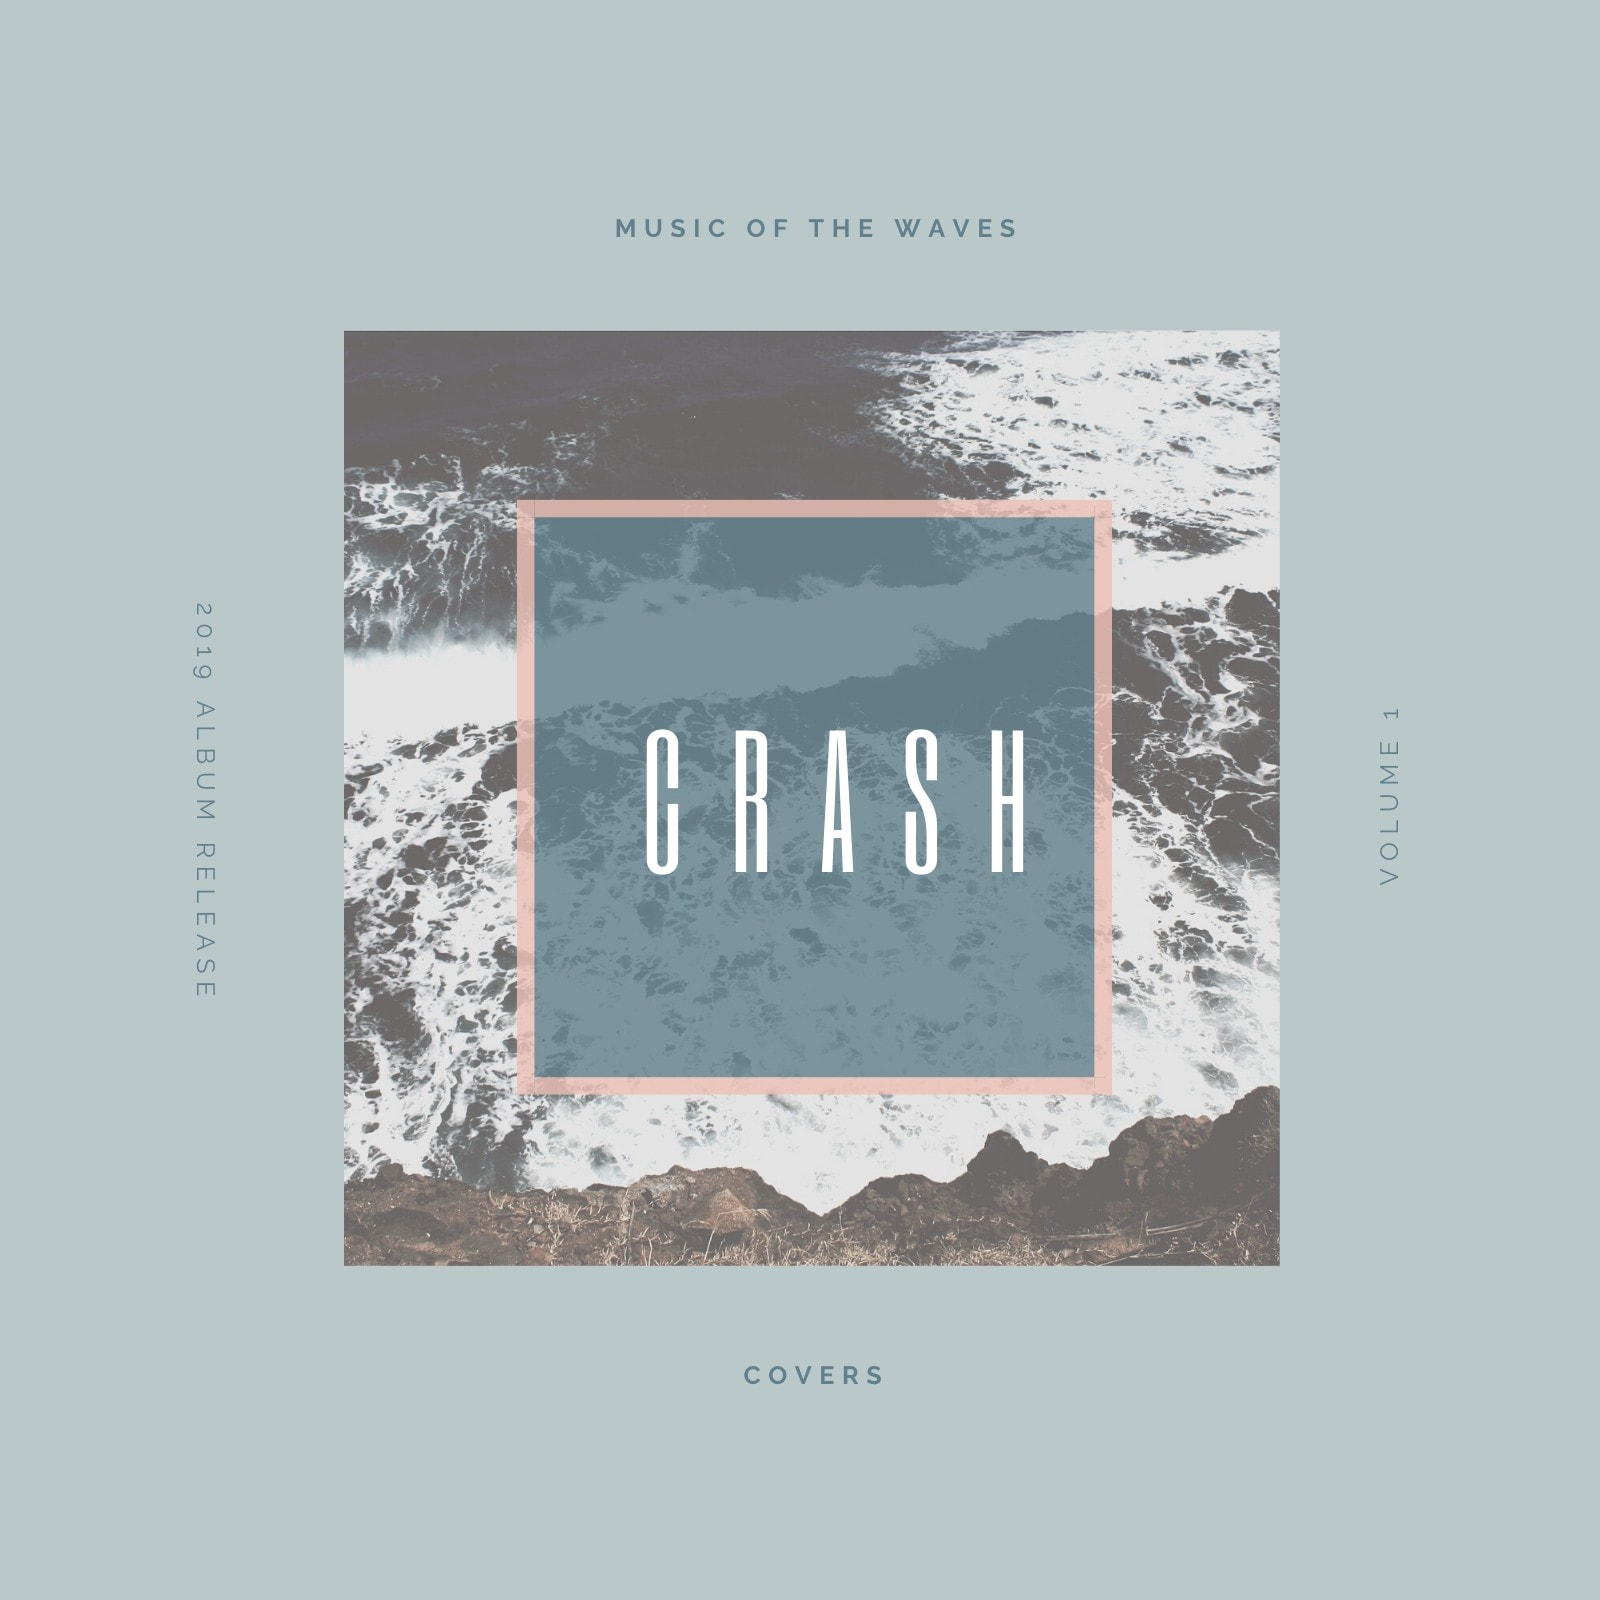 Blue Waves CD Album Cover